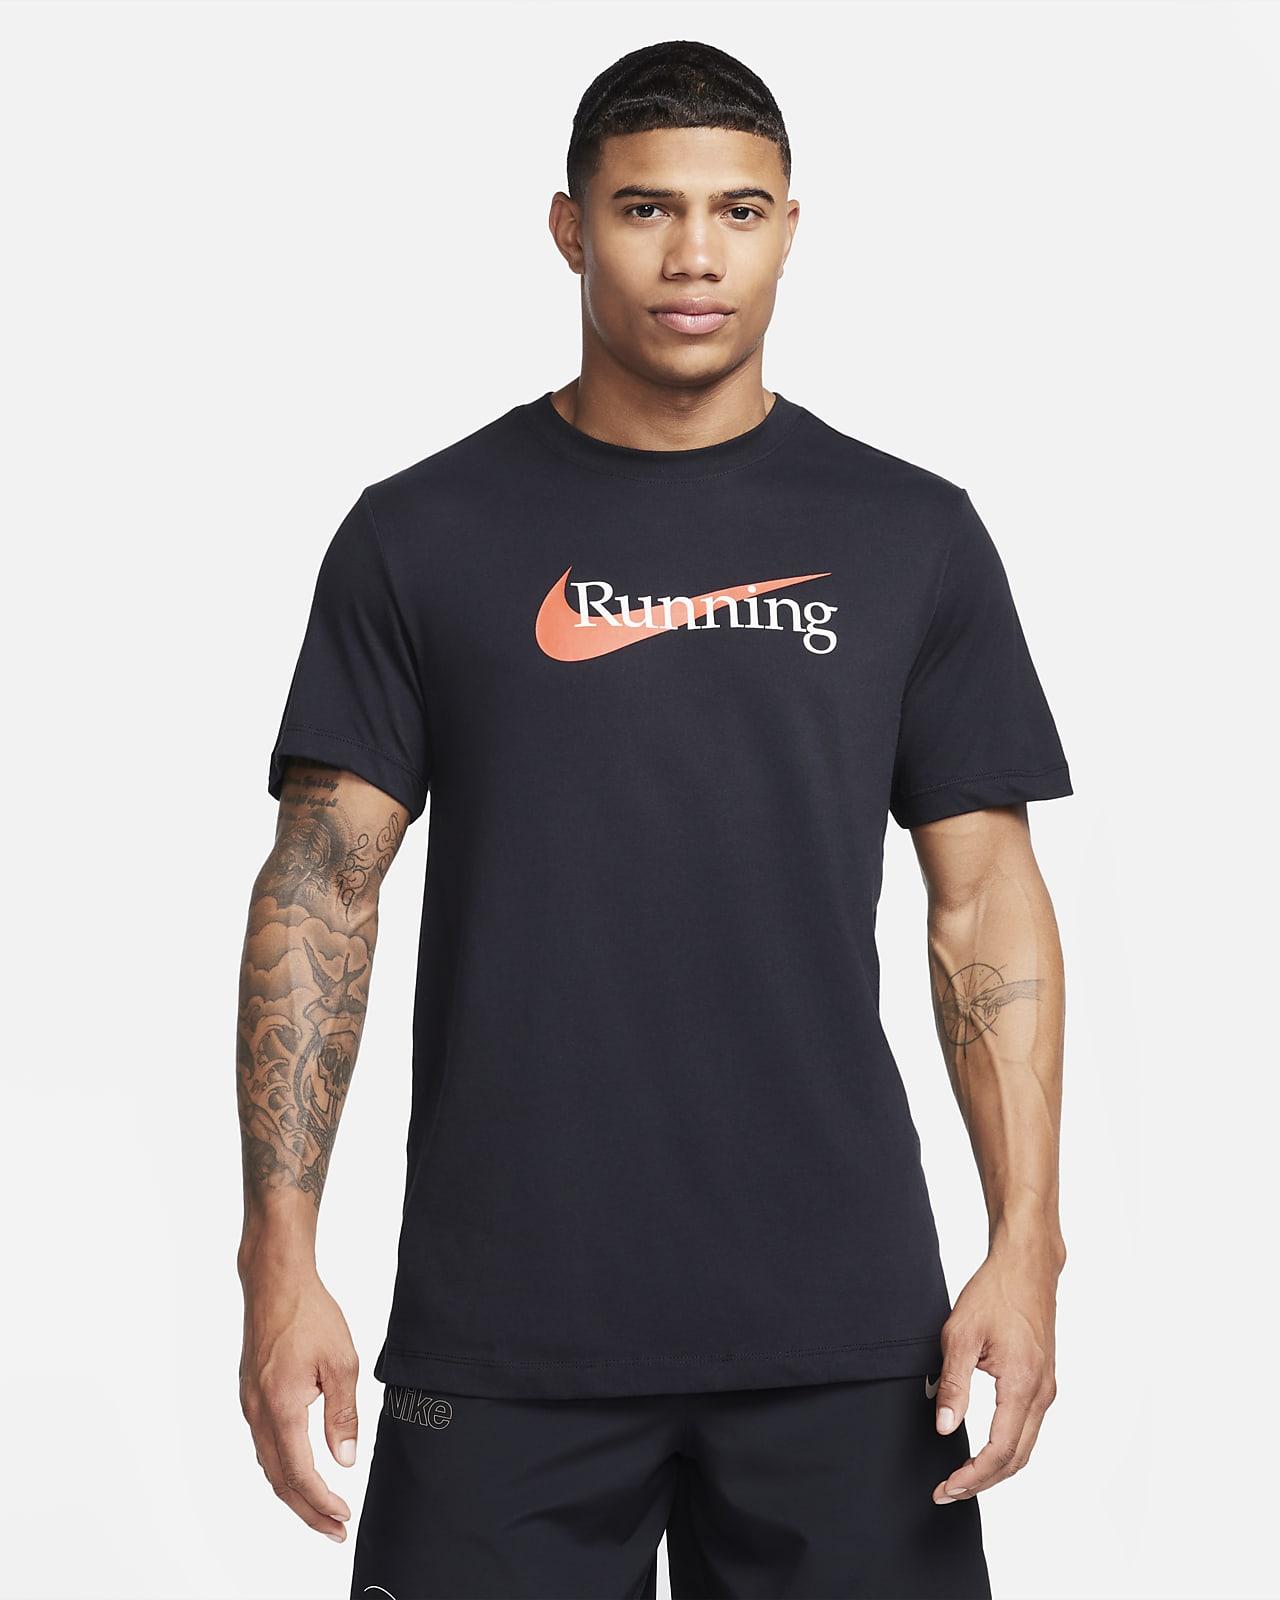 Nike Dri-FIT-løbe-T-shirt til mænd